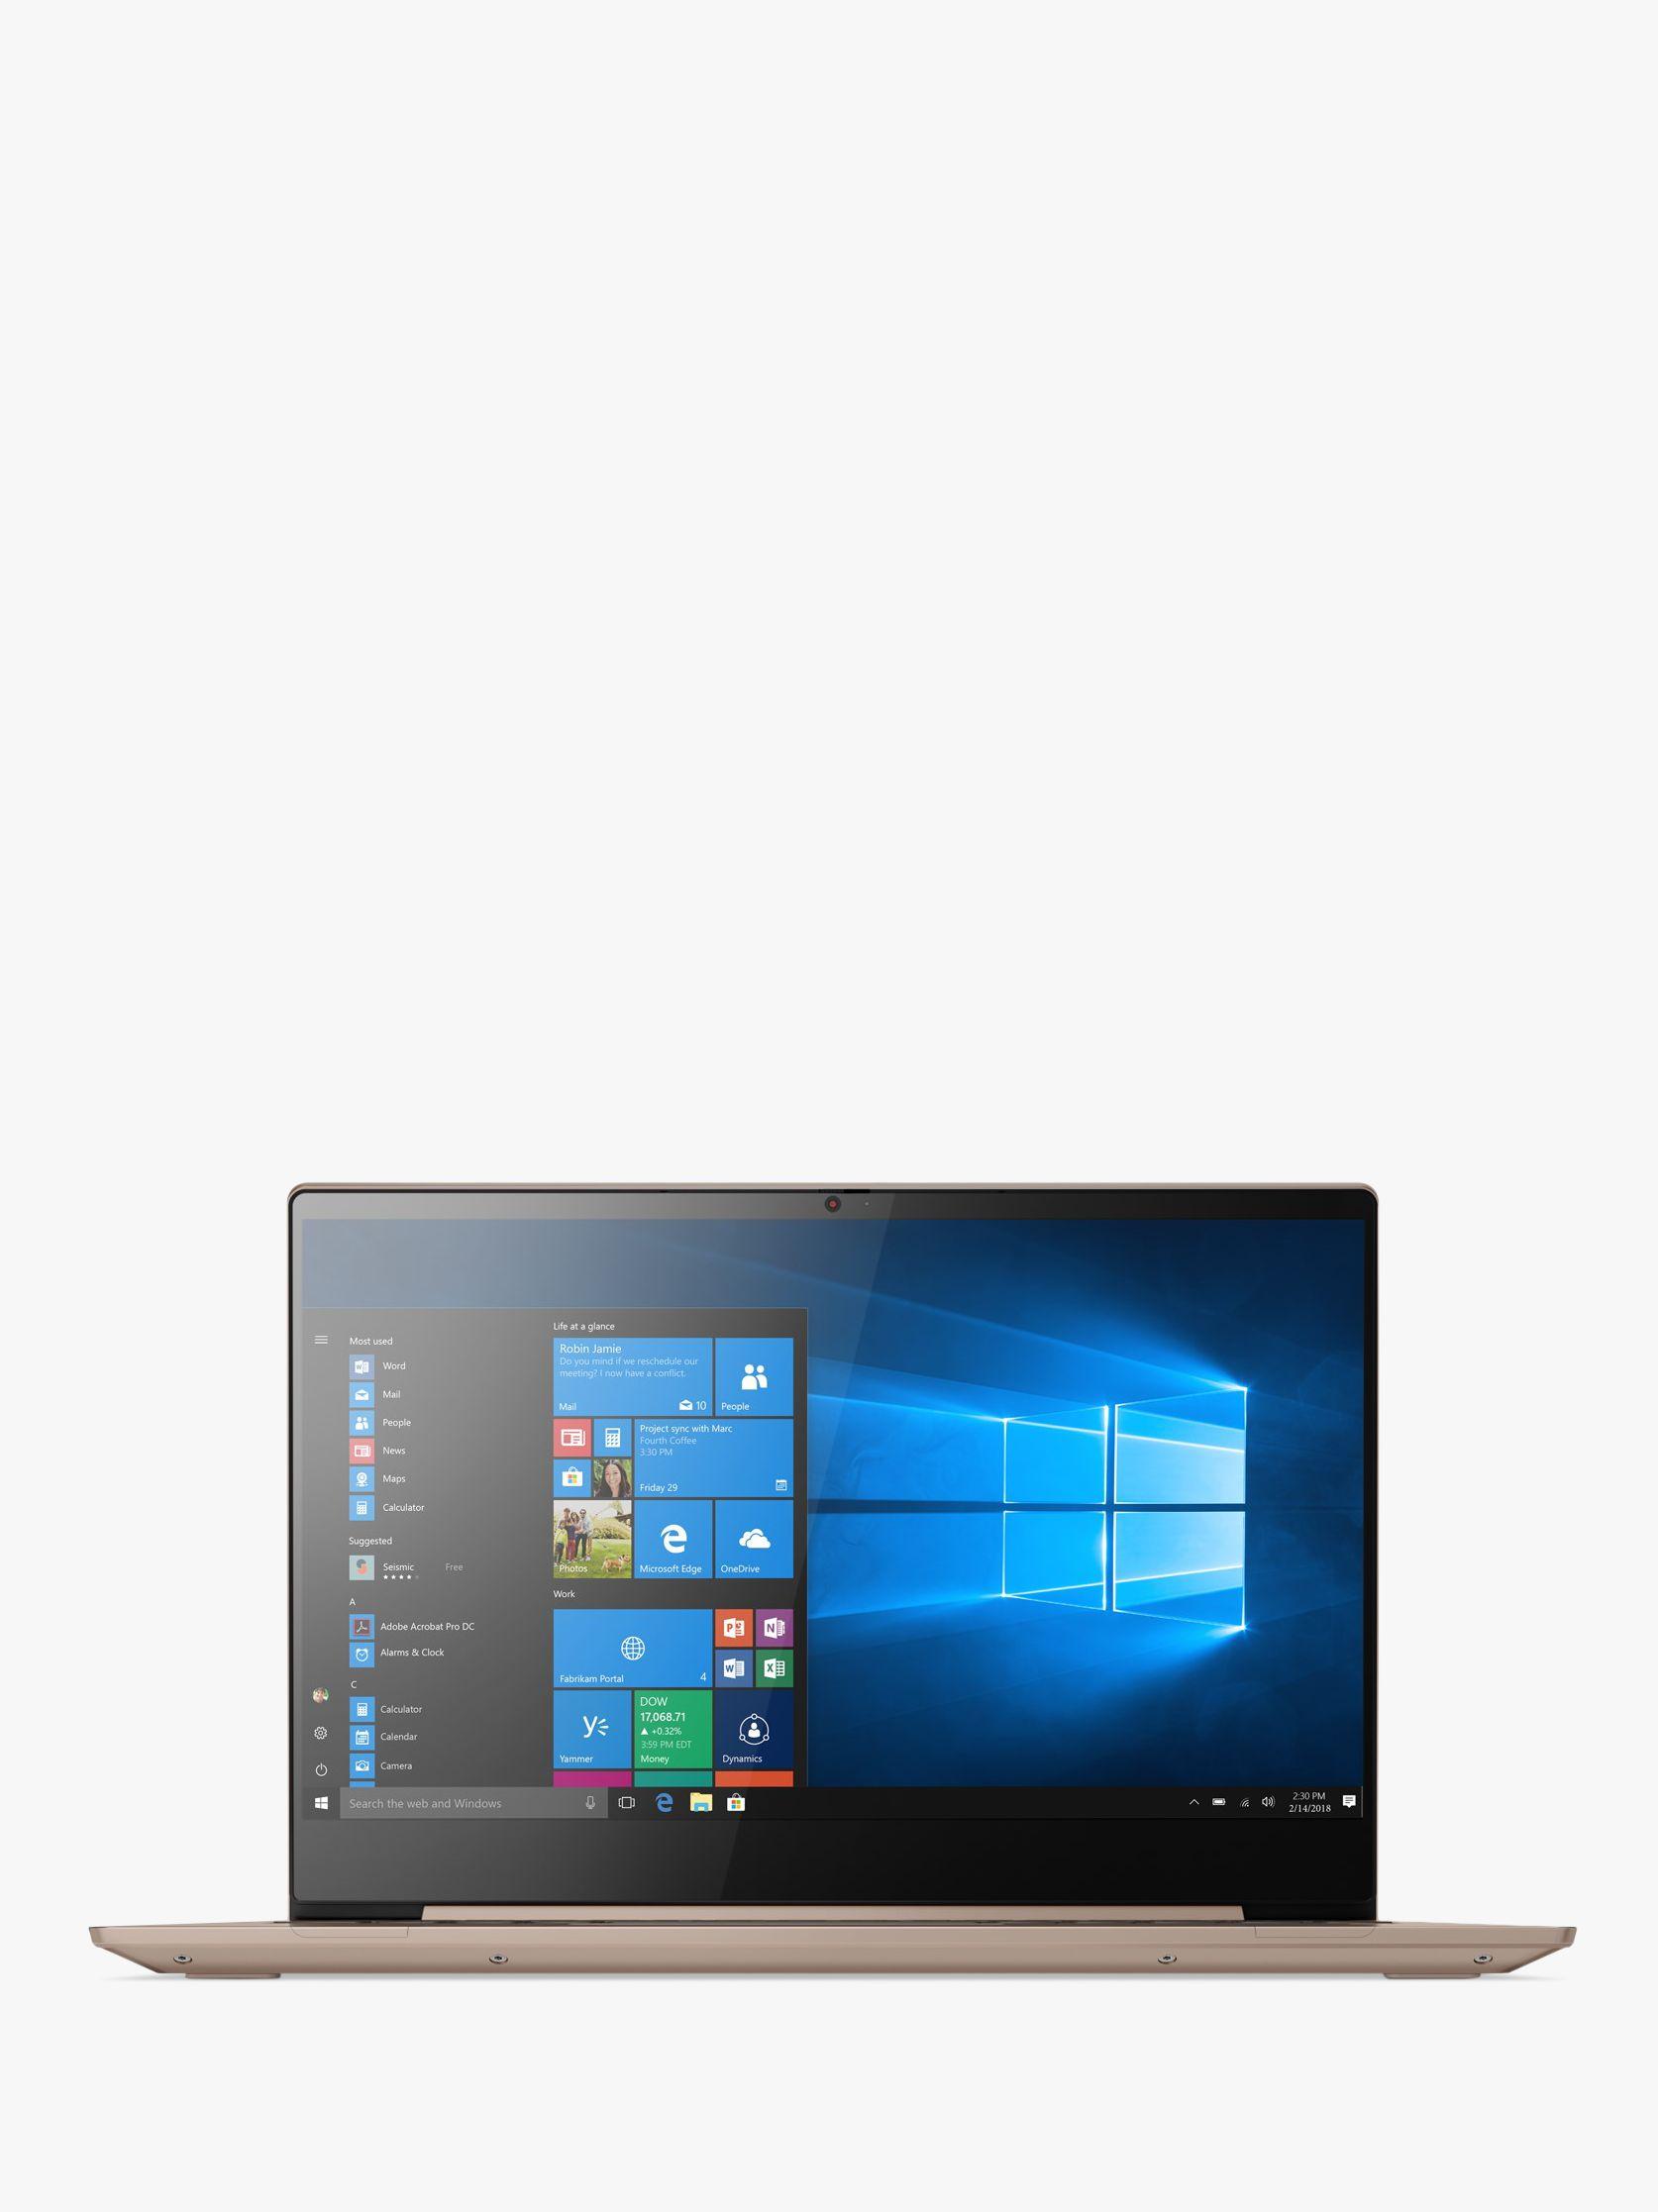 Lenovo Lenovo IdeaPad Ideapad S540-14API Laptop, AMD Ryzen 5 Processor, 8GB RAM, 256GB SSD, 14 Full HD, Rose Gold